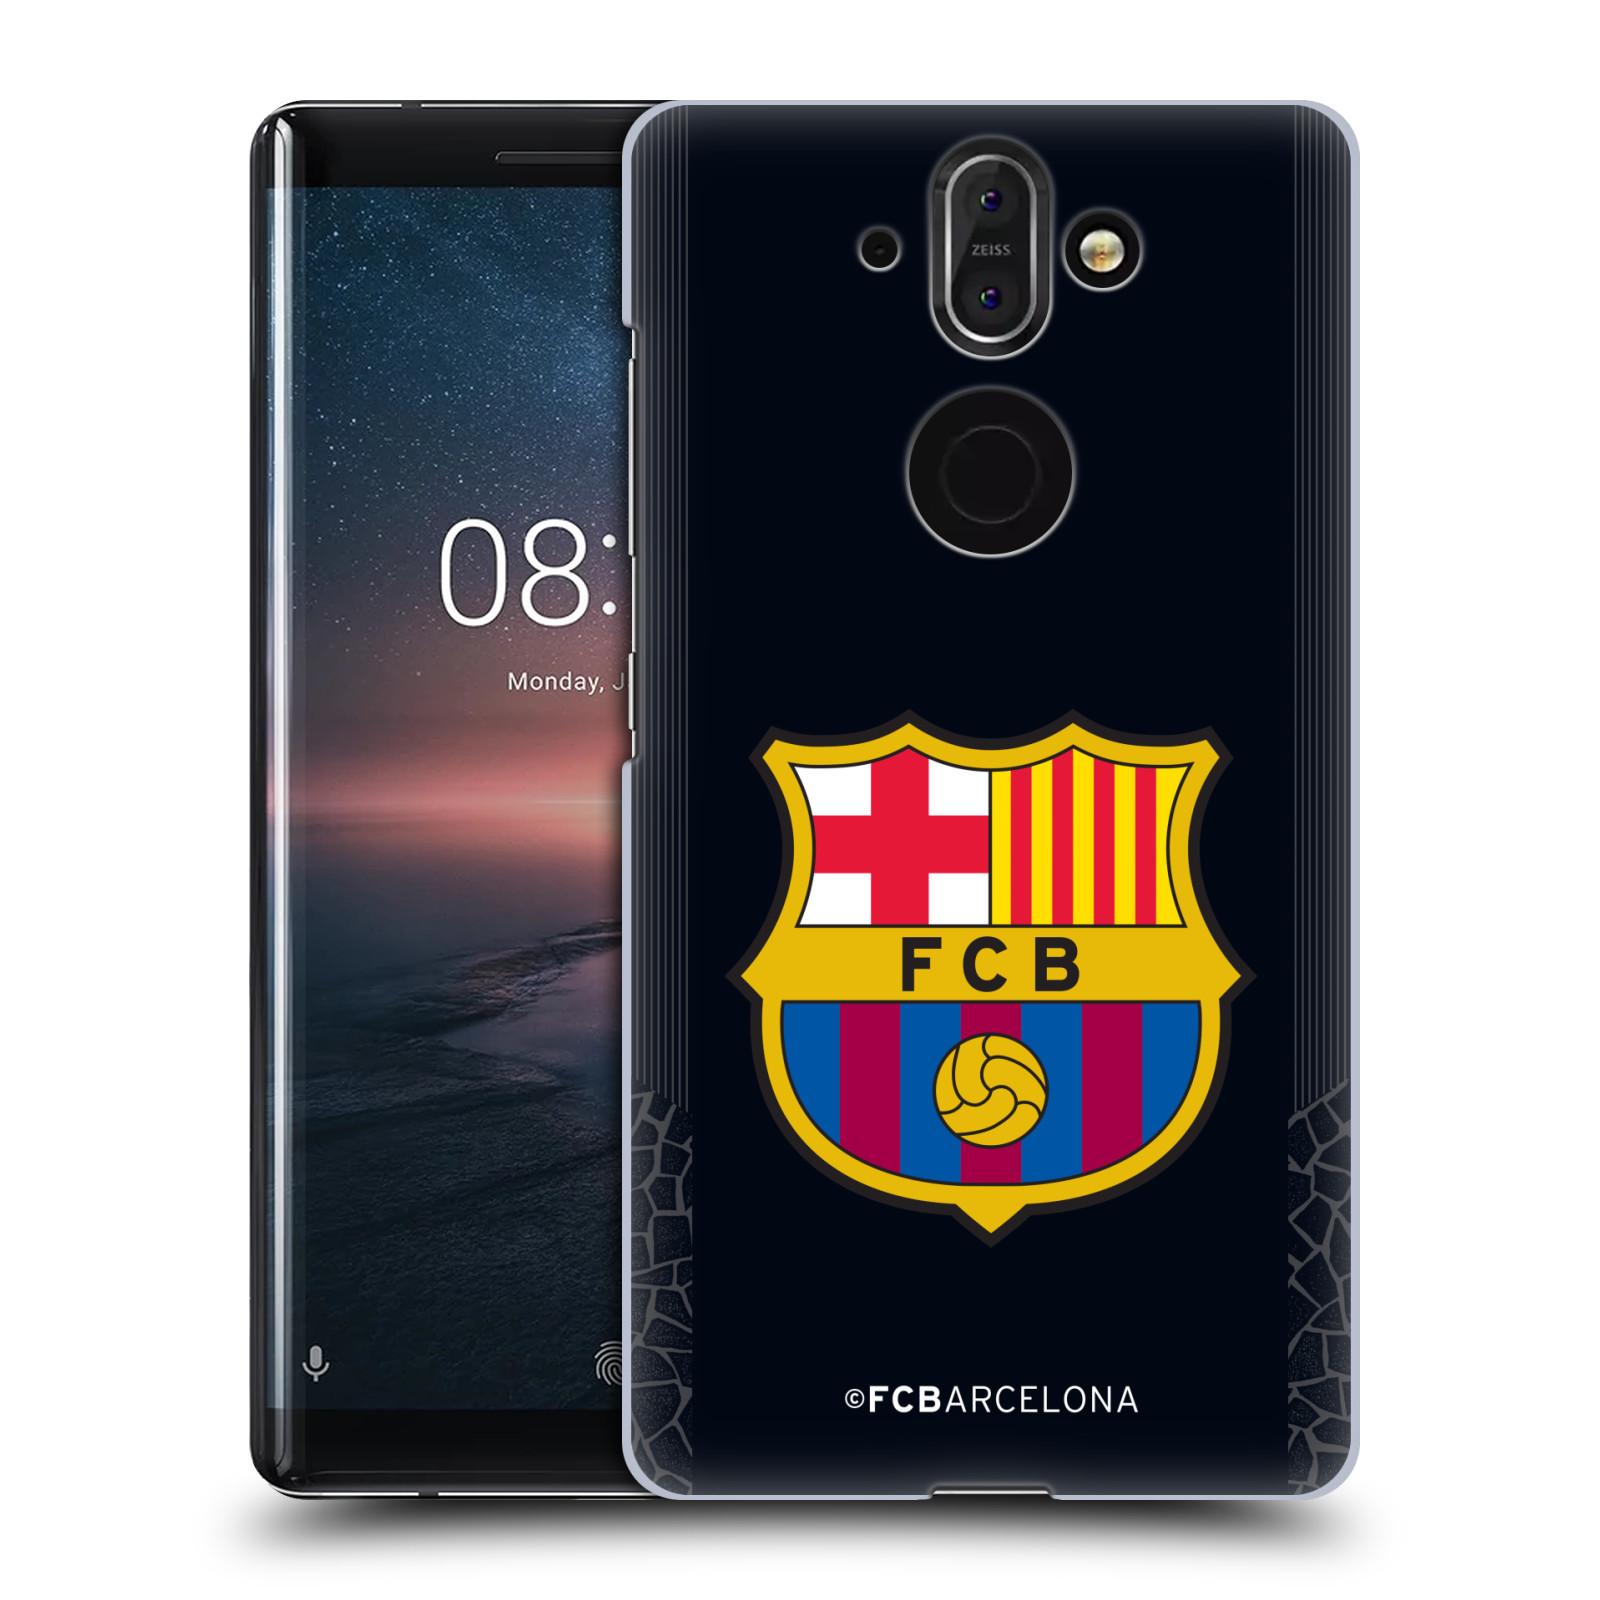 Plastové pouzdro na mobil Nokia 8 Sirocco - Head Case - FC Barcelona - Goalkeeper black logo